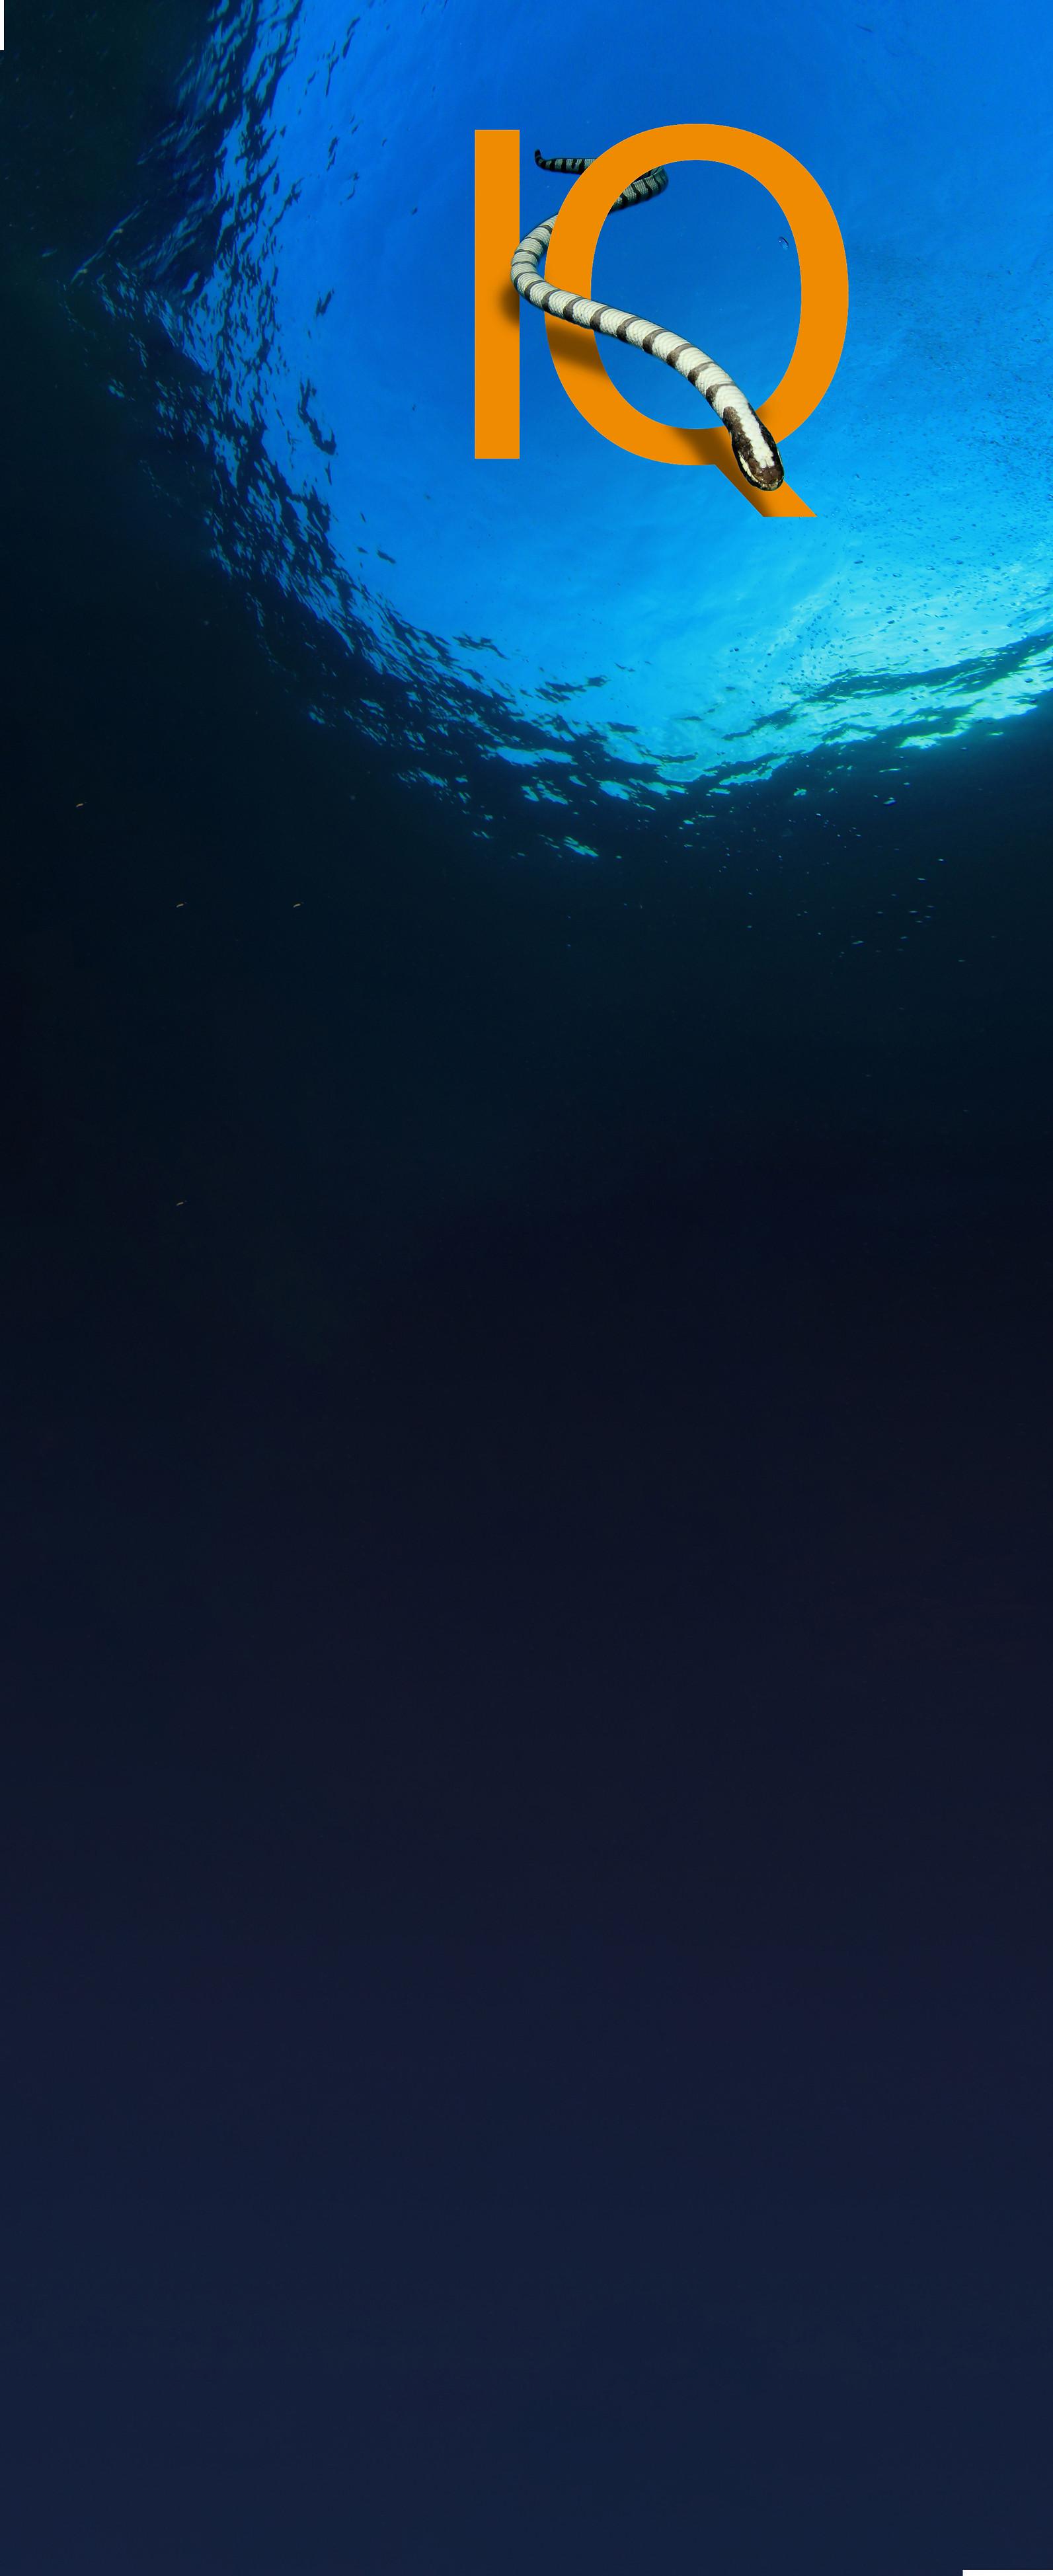 OCEAN-_IQ-Resources-exLONG-SMALL.jpg